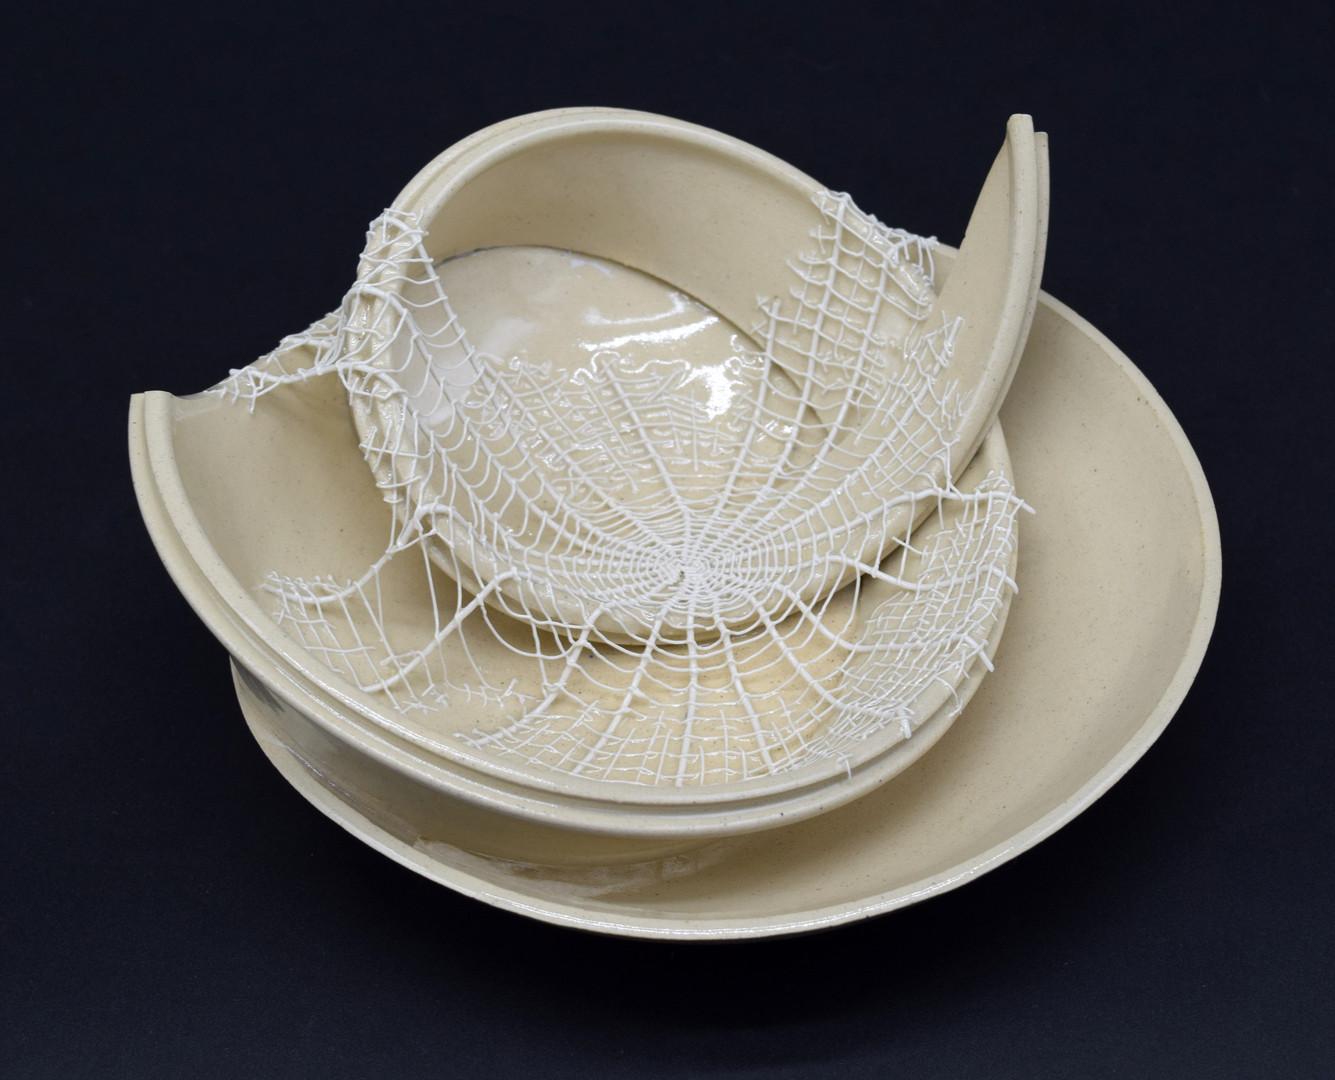 Tethered Web